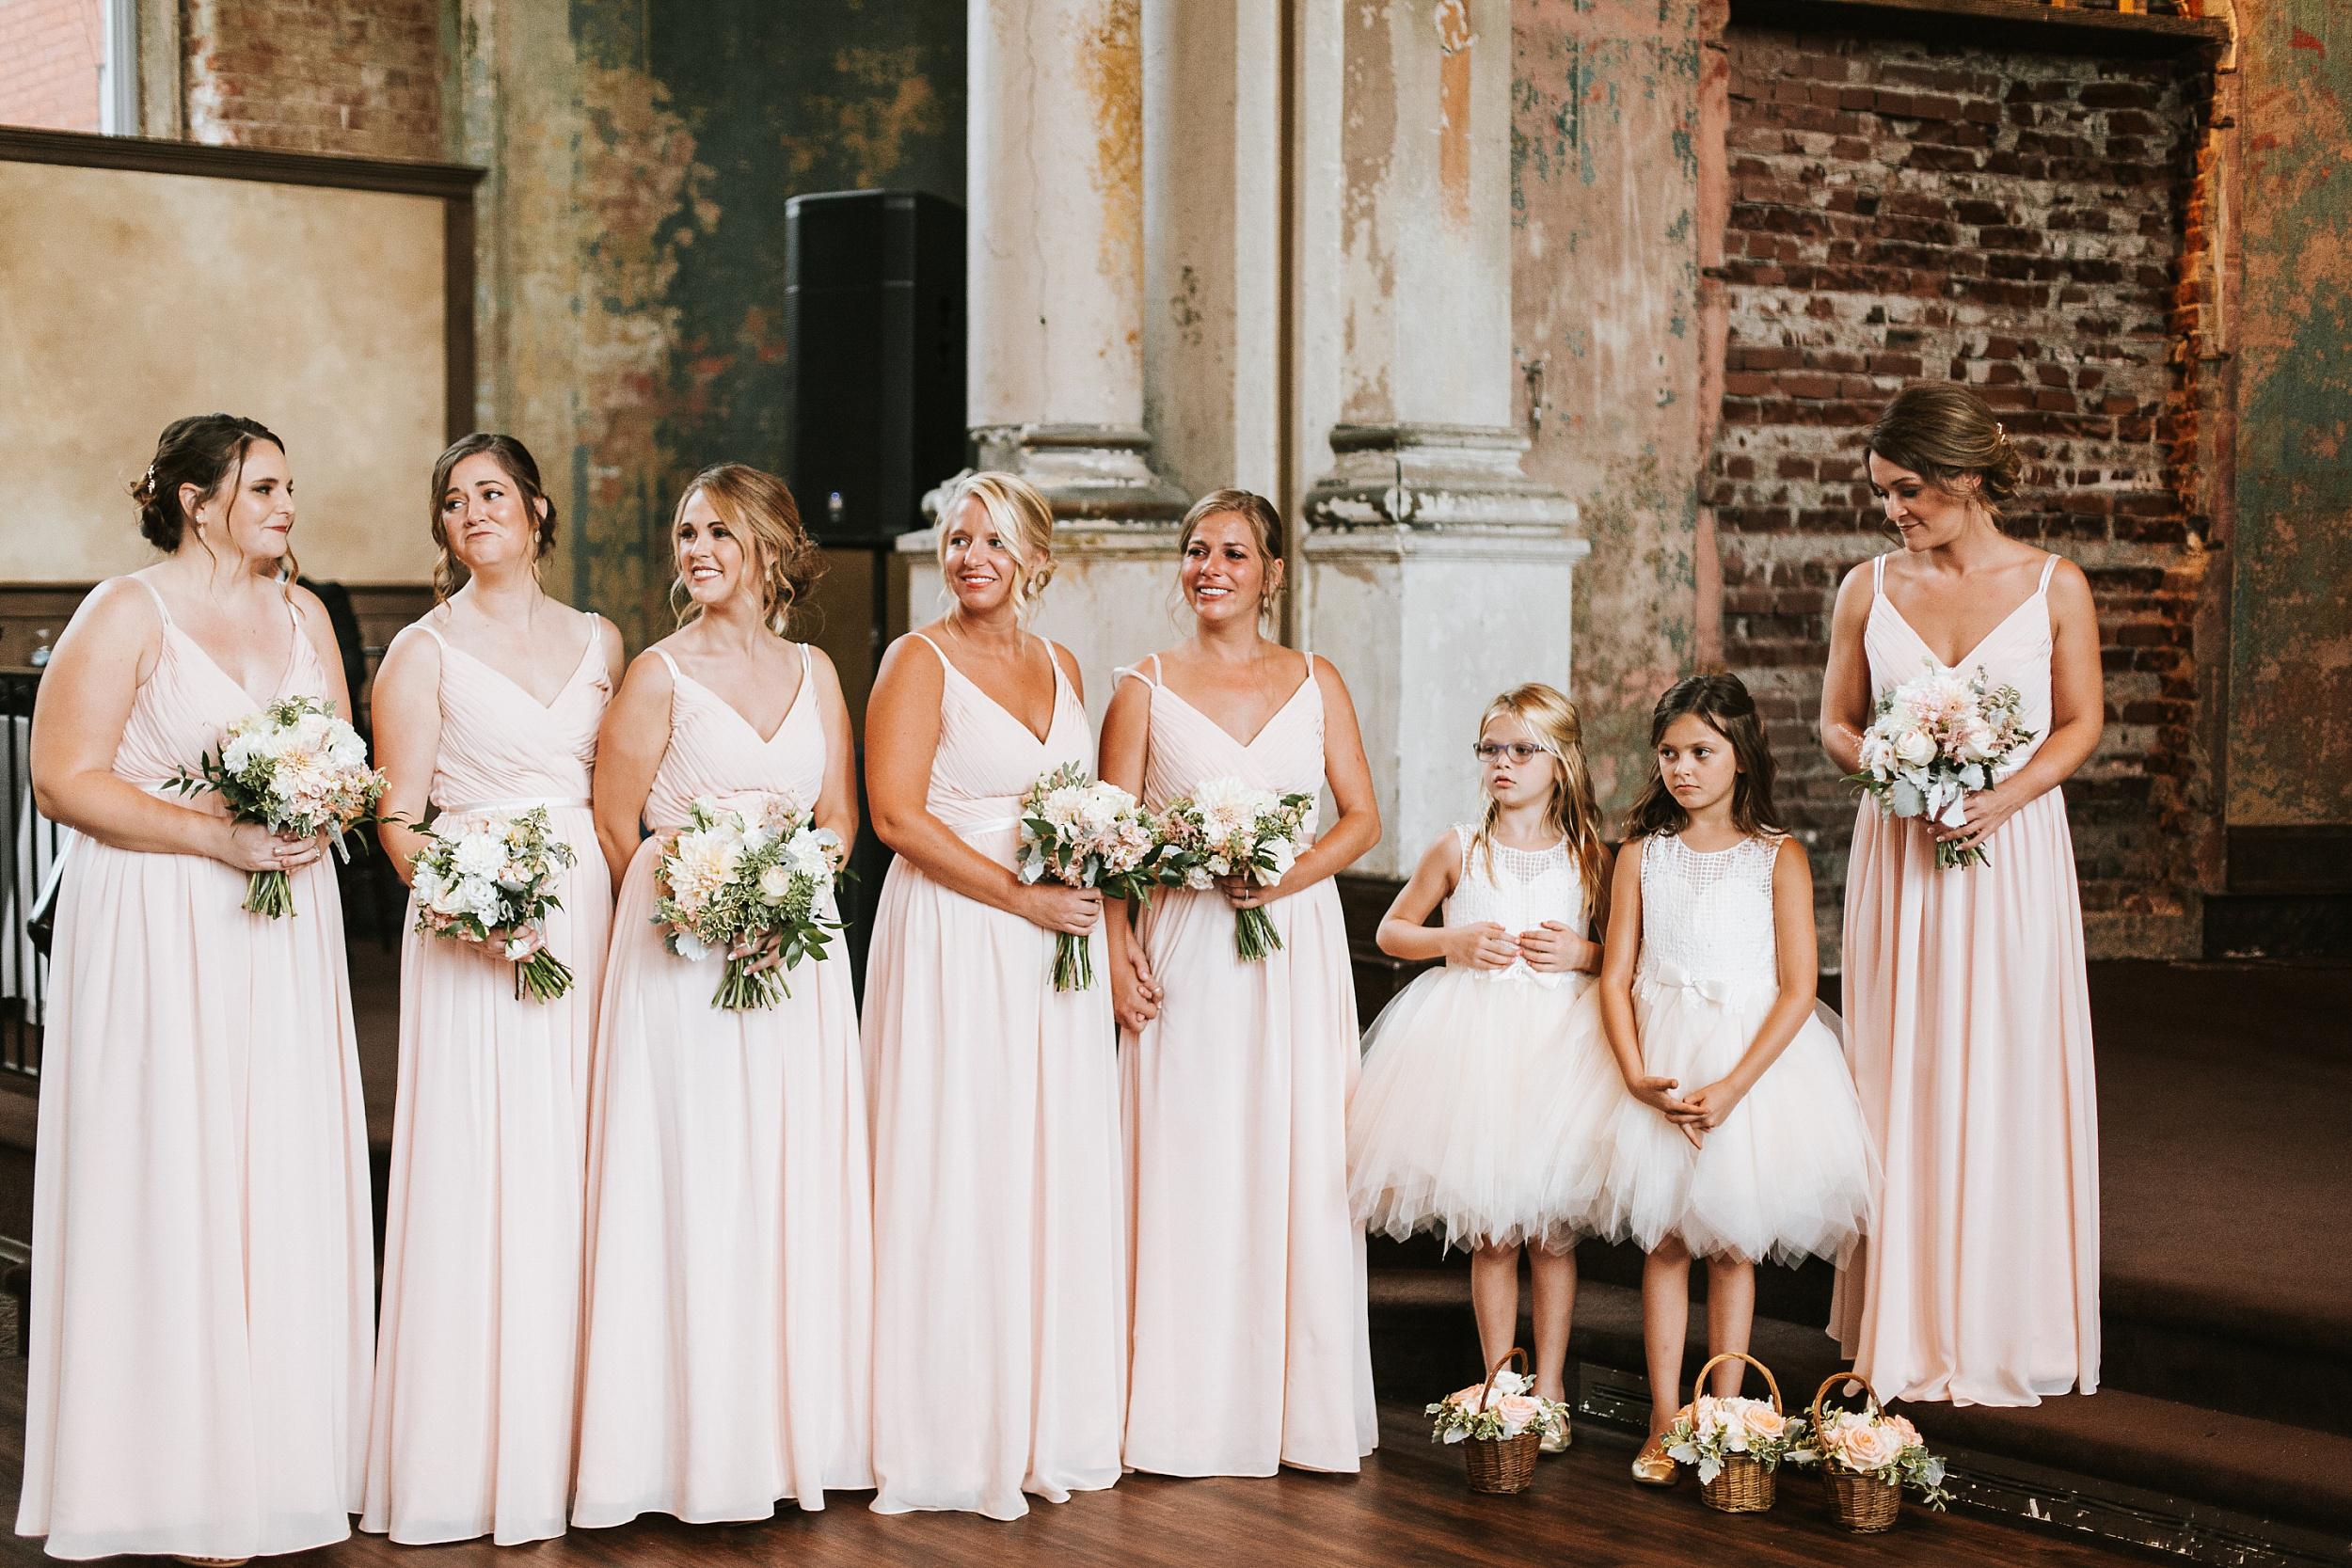 Brooke Townsend Photography - Cincinnati Wedding Photographer (107 of 170).jpg